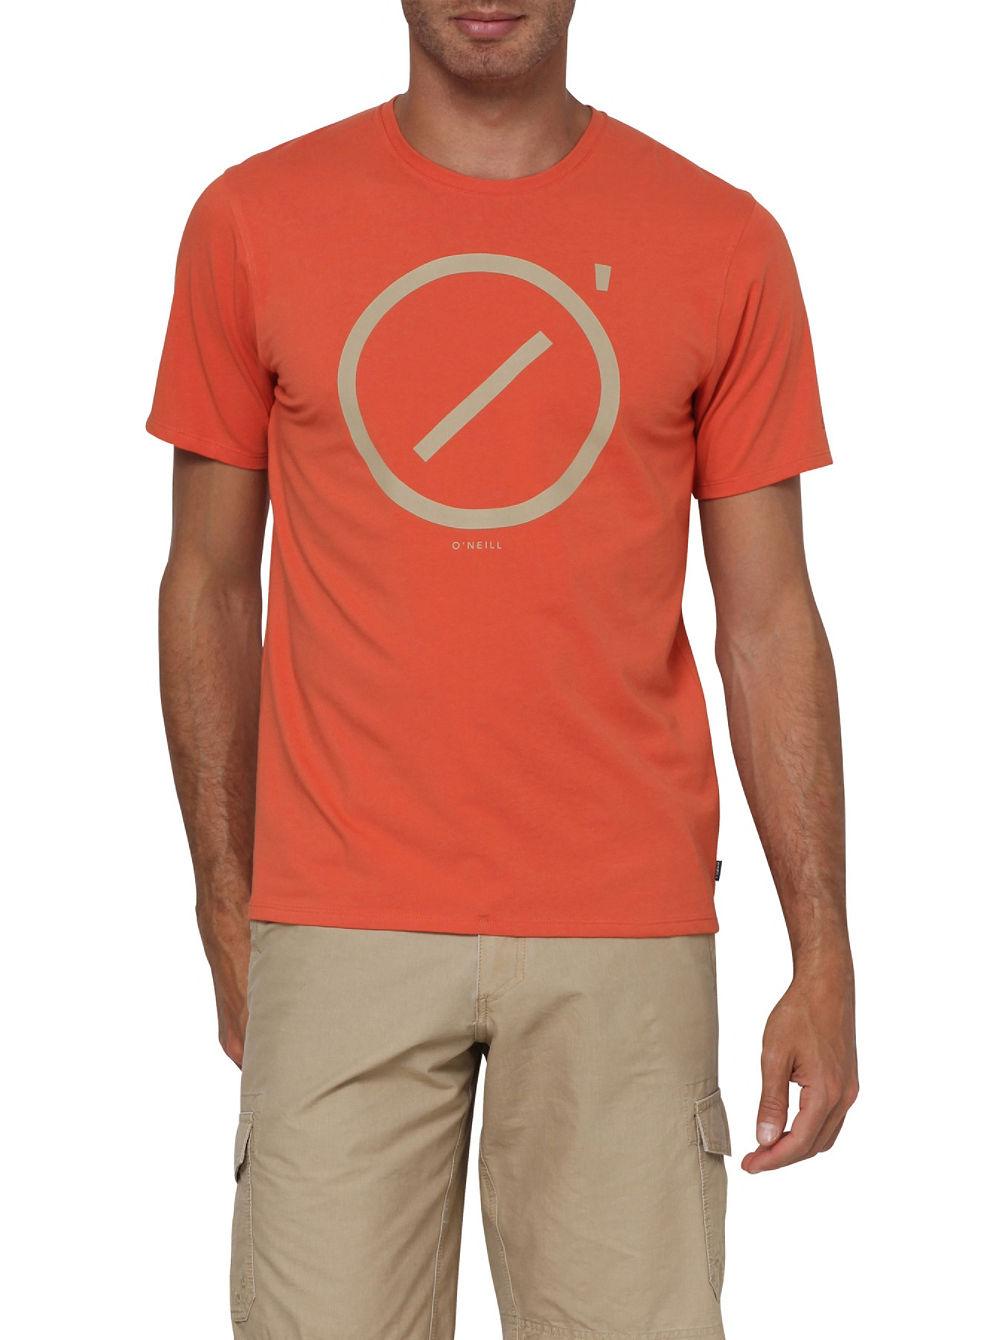 hybrid-target-t-shirt